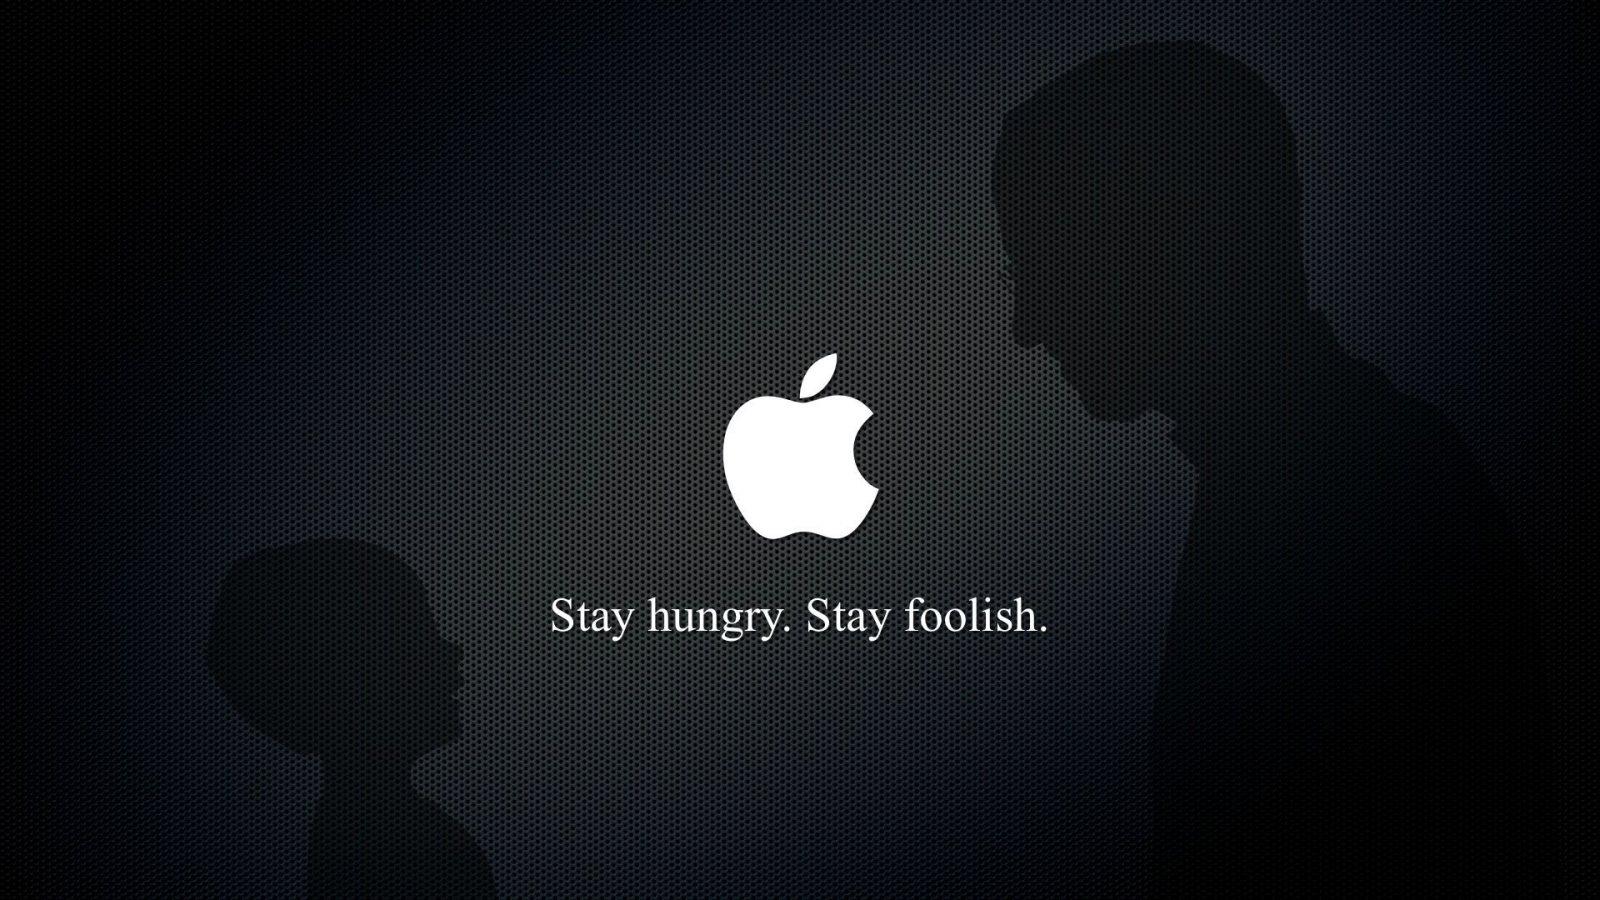 Iphone 6 Wallpaper Steve Jobs Quote Steve Jobs Quotes Wallpaper Quotesgram